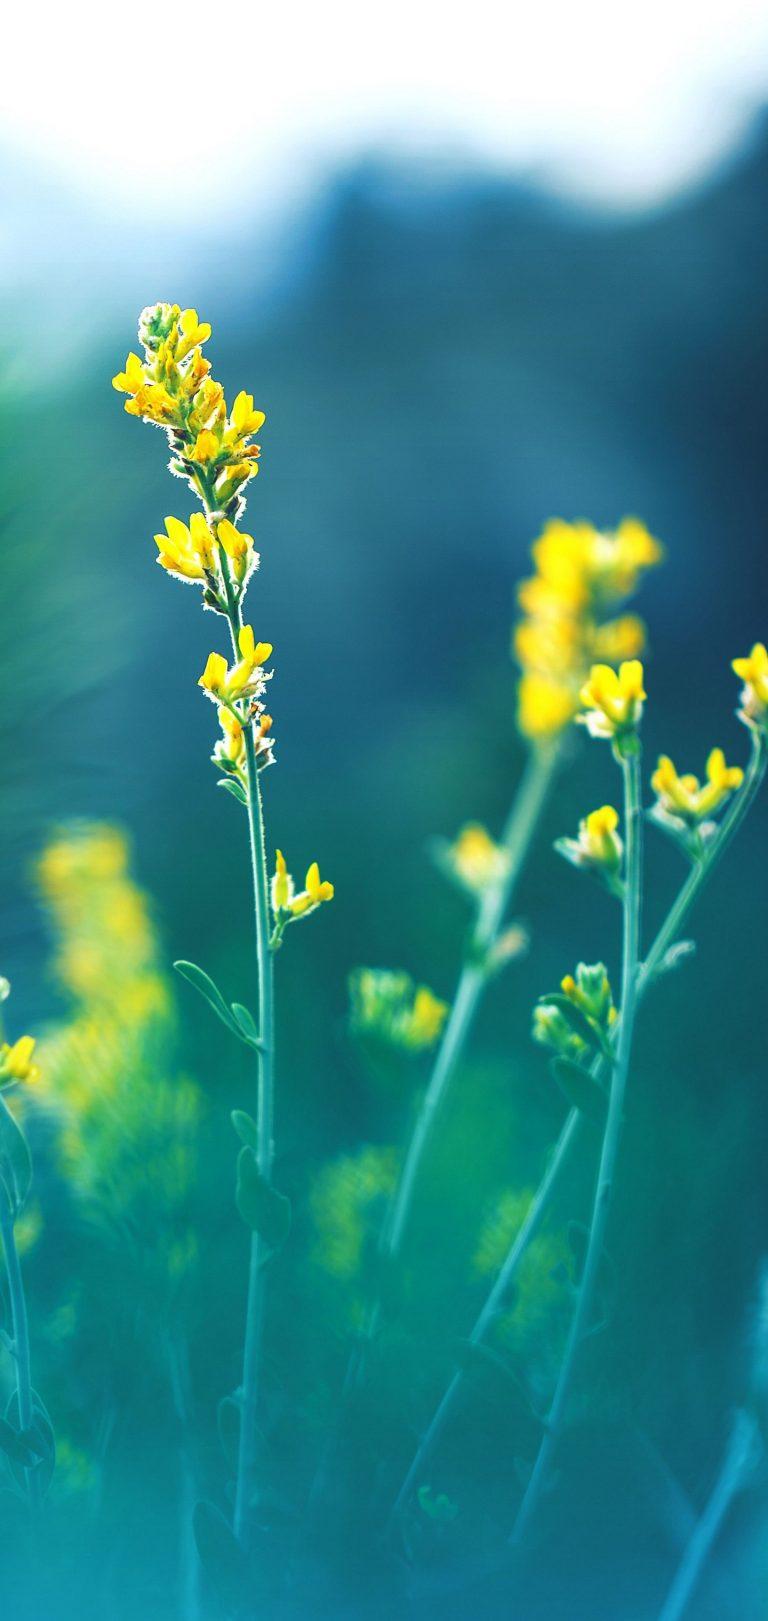 Yellow Flowers Blur Wallpaper 1440x3040 768x1621